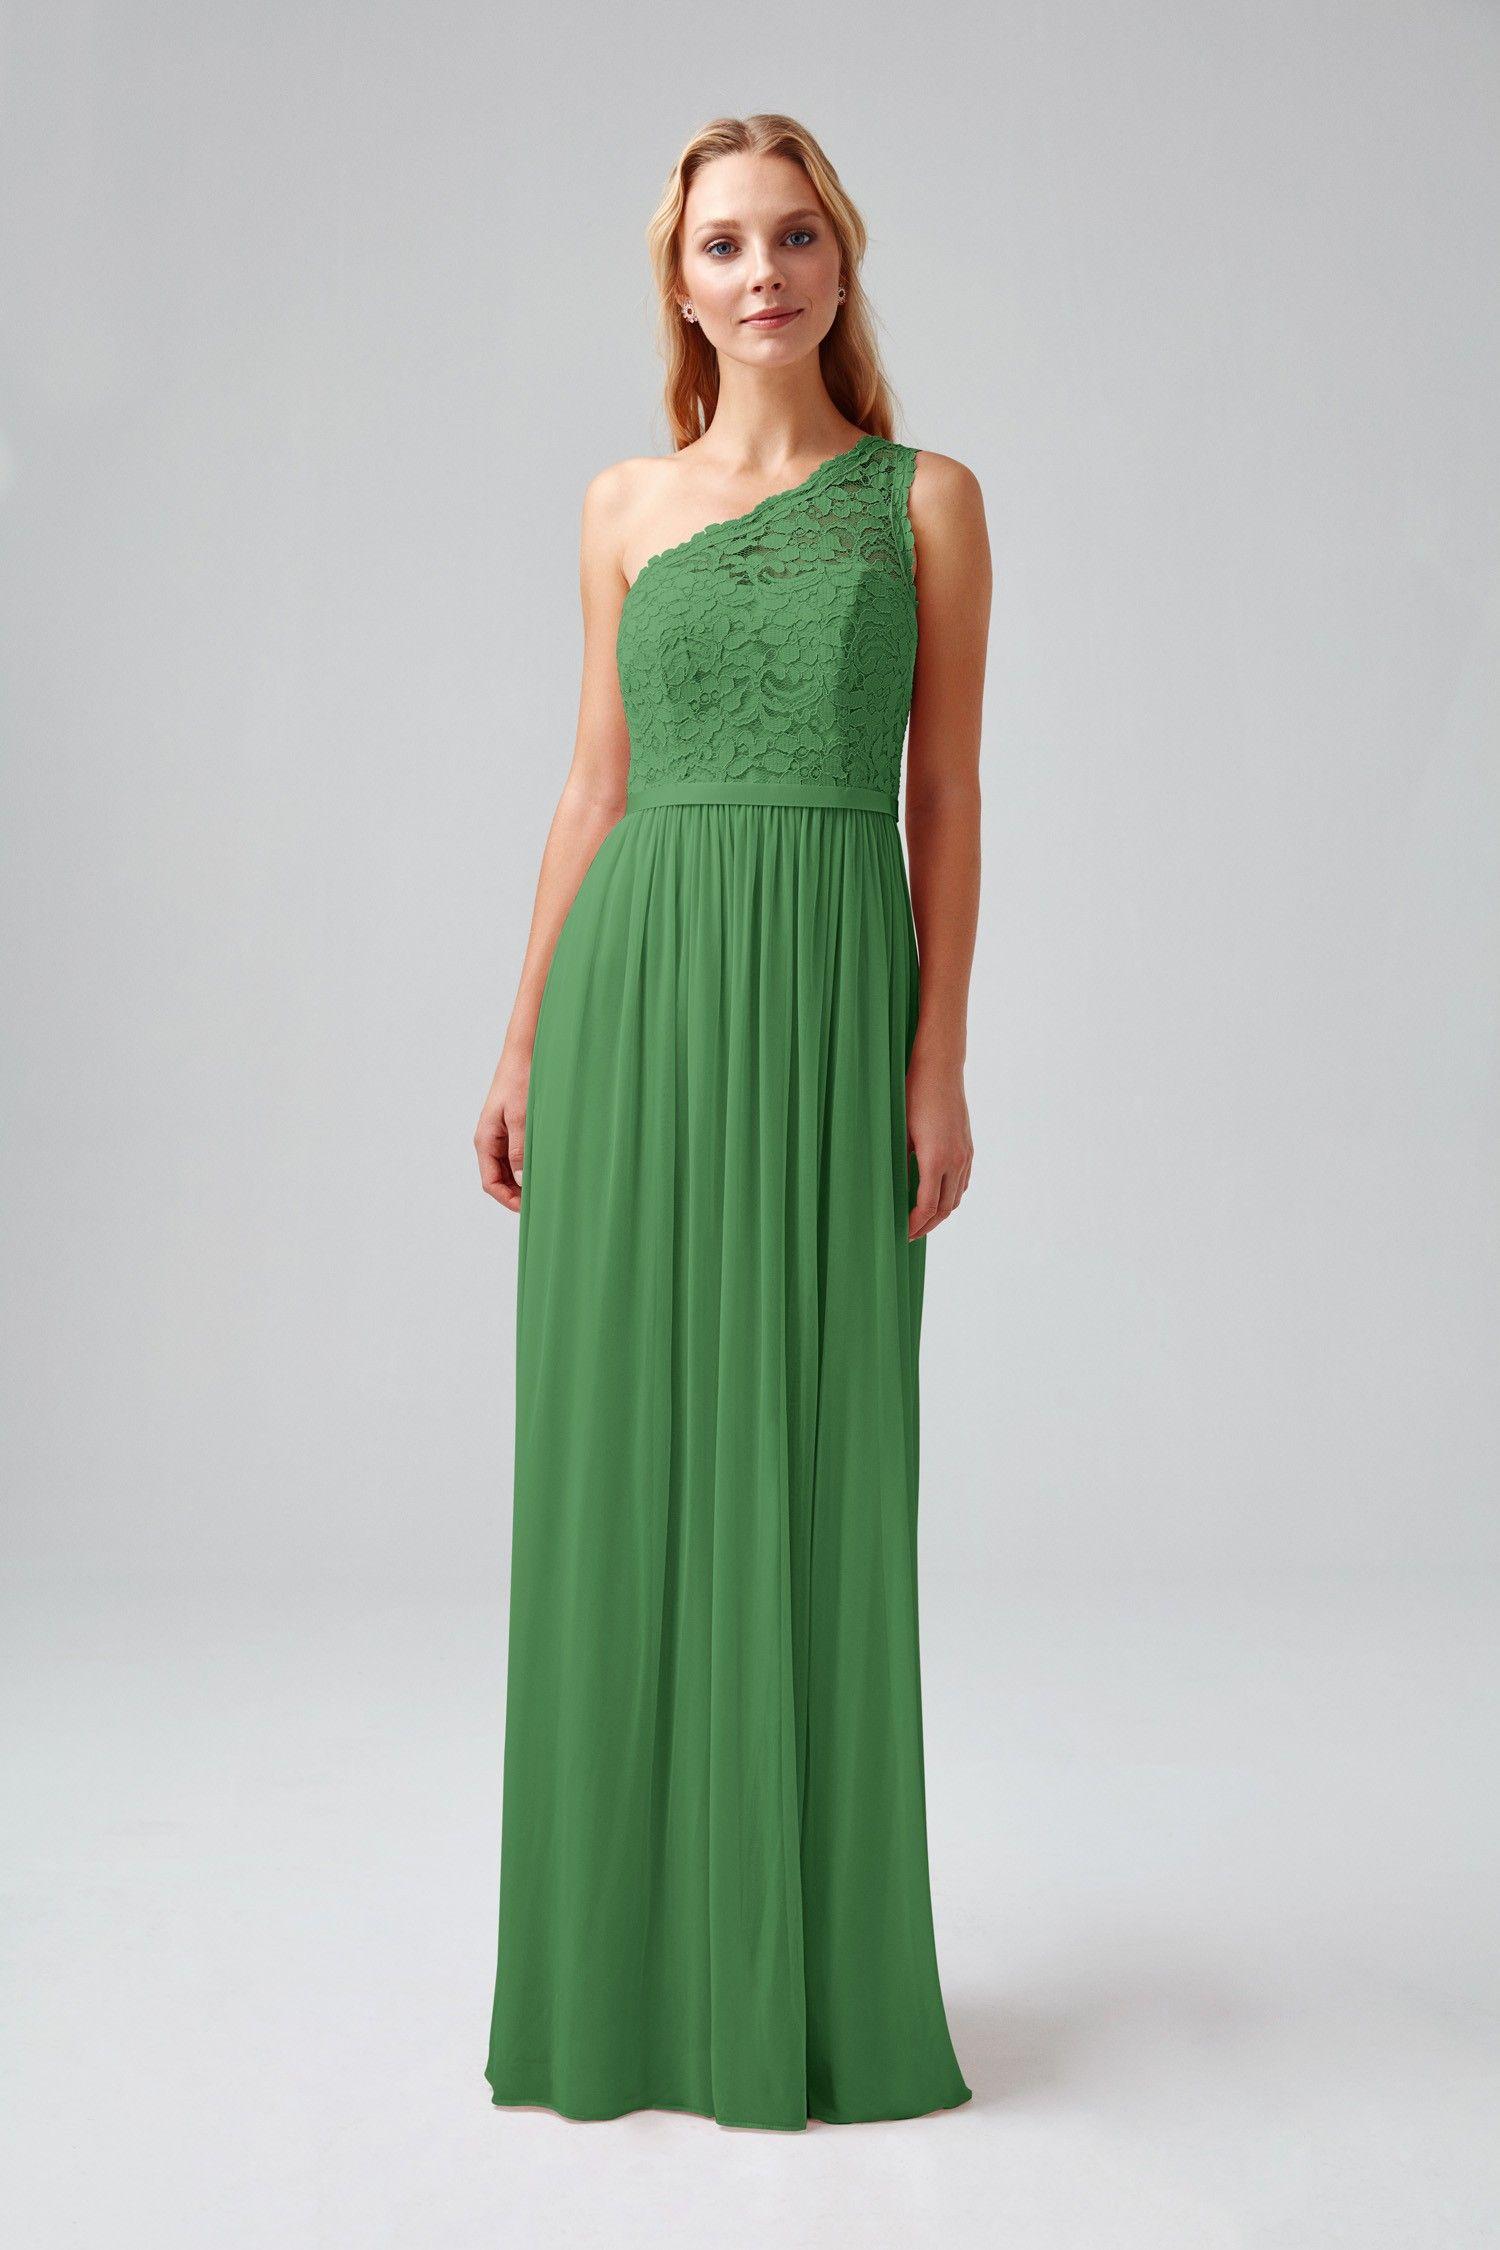 d424c7a8dd Long One Shoulder Lace Bridesmaid Dress-F17063